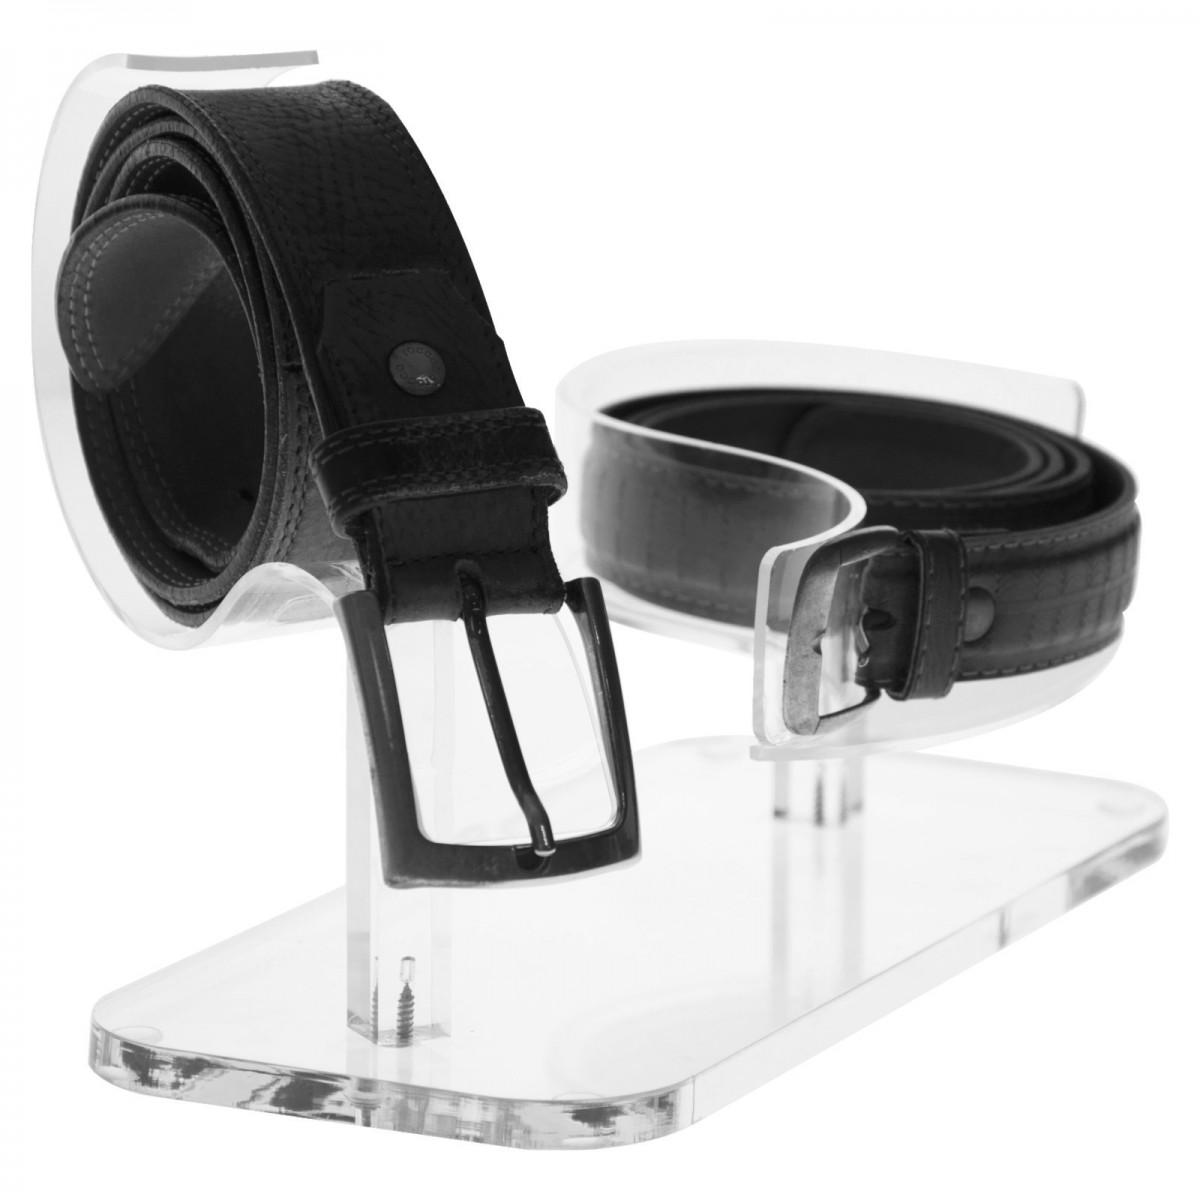 E-301 EPC - Porta cintura in plexiglass trasparente a 2 postazioni